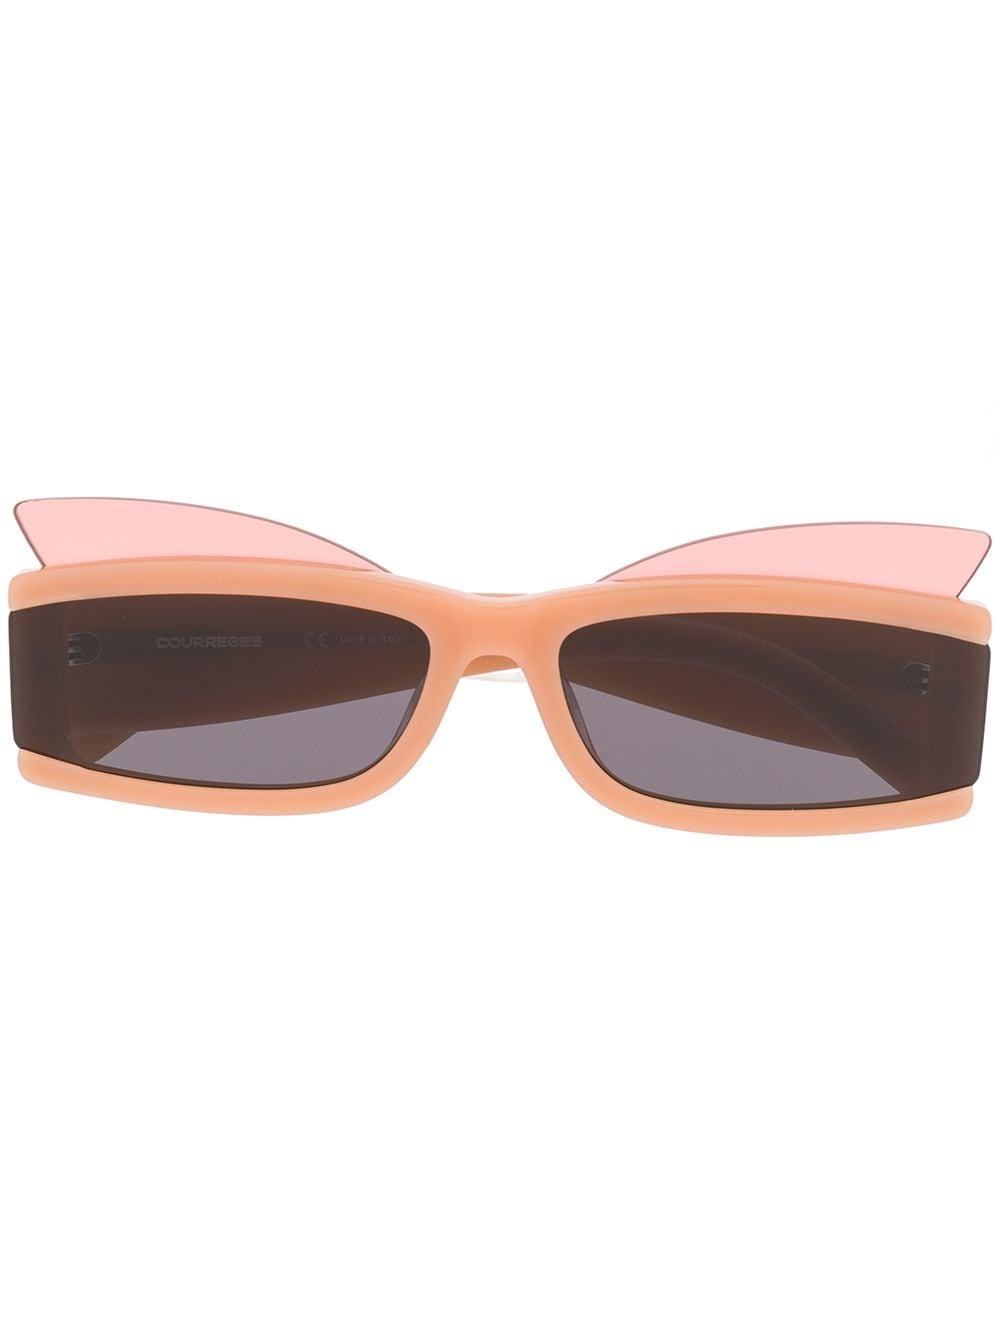 Courrèges Eyewear Eckige Sonnenbrille - Nude